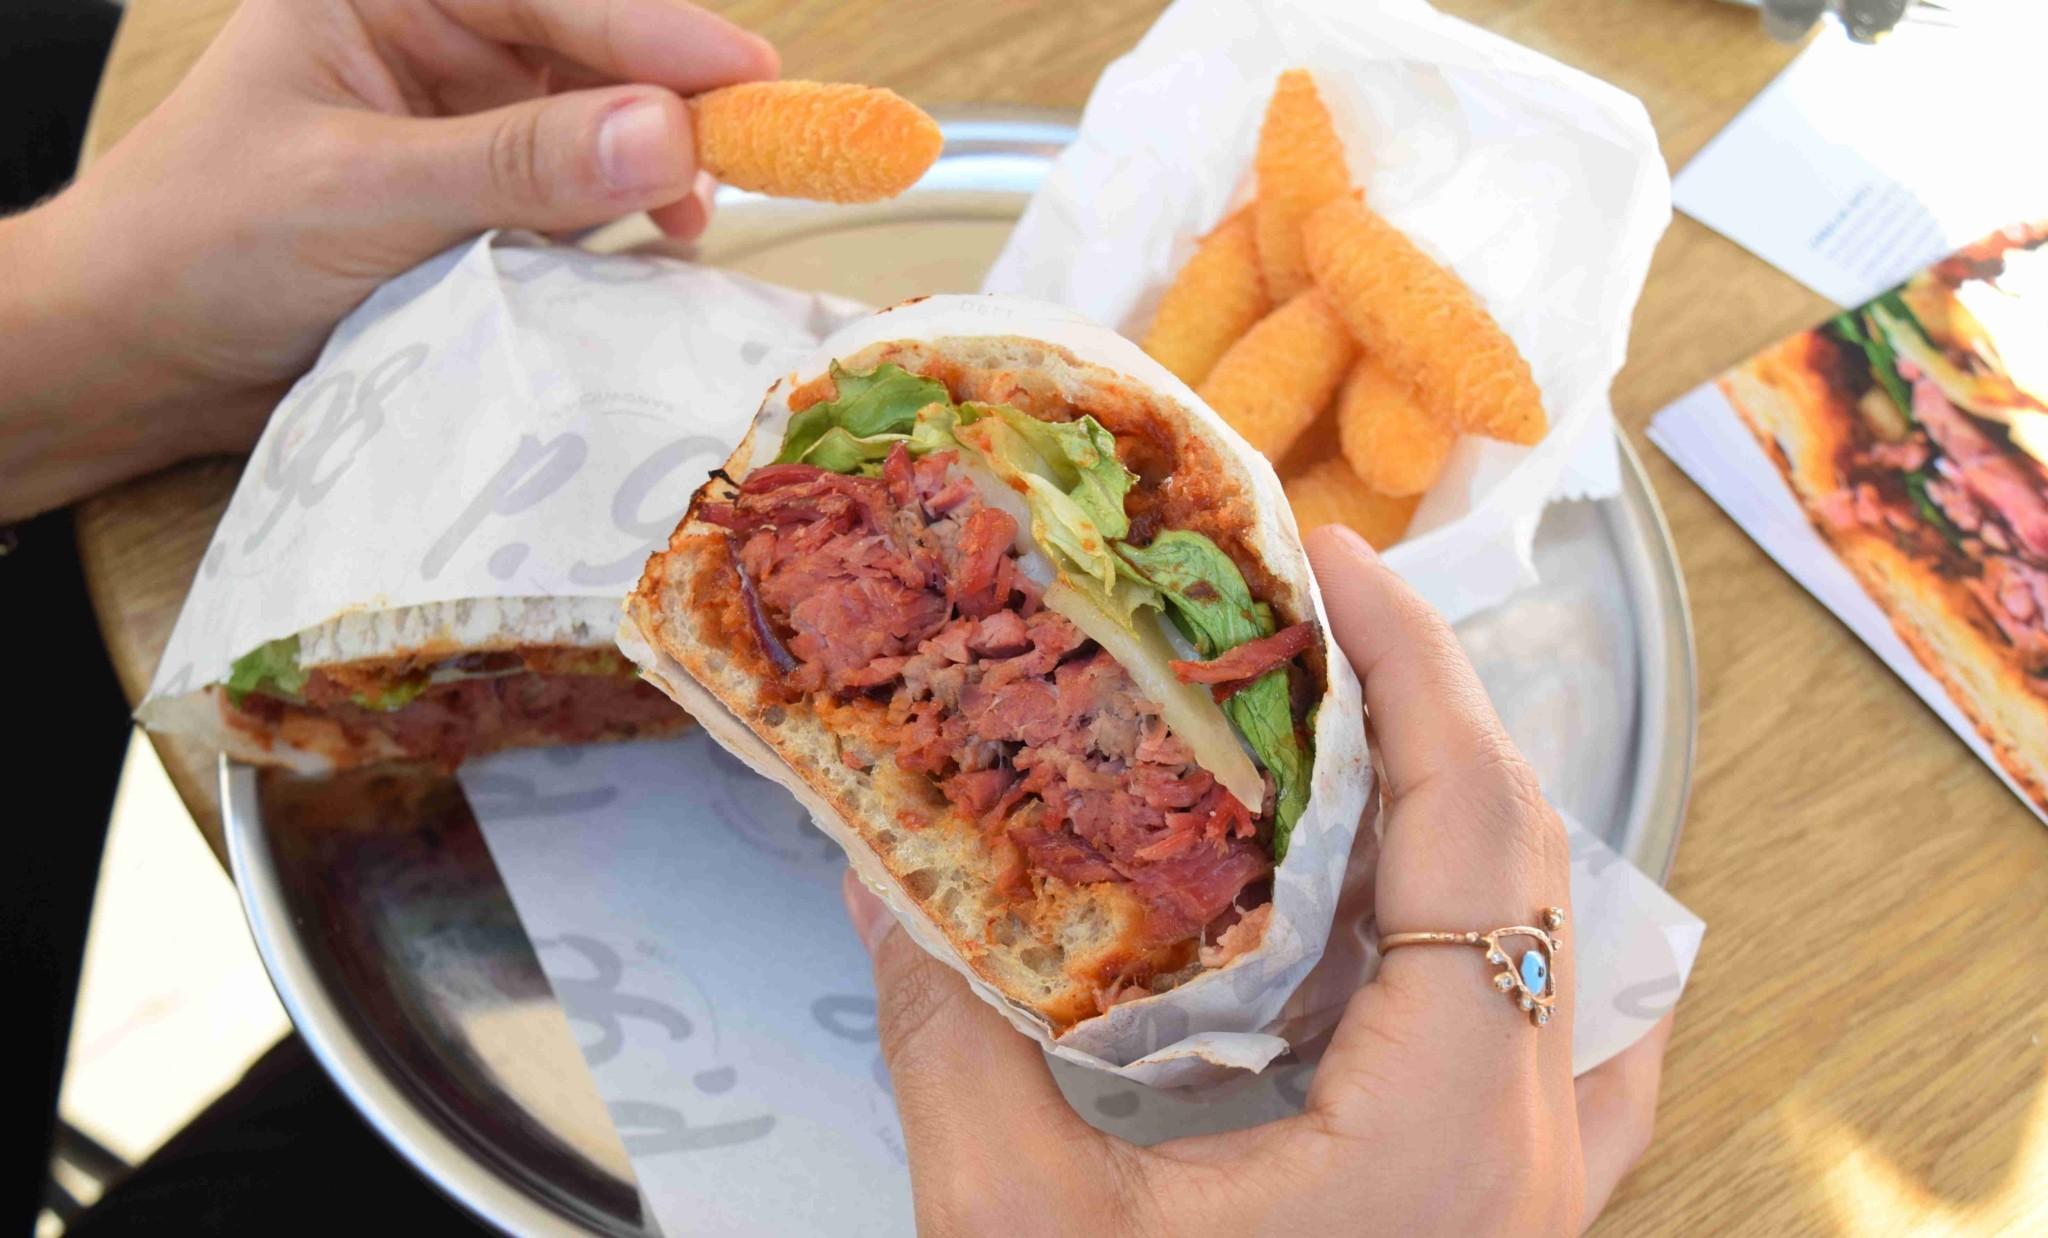 cornbeef-sandvic-86d deli sandwiches